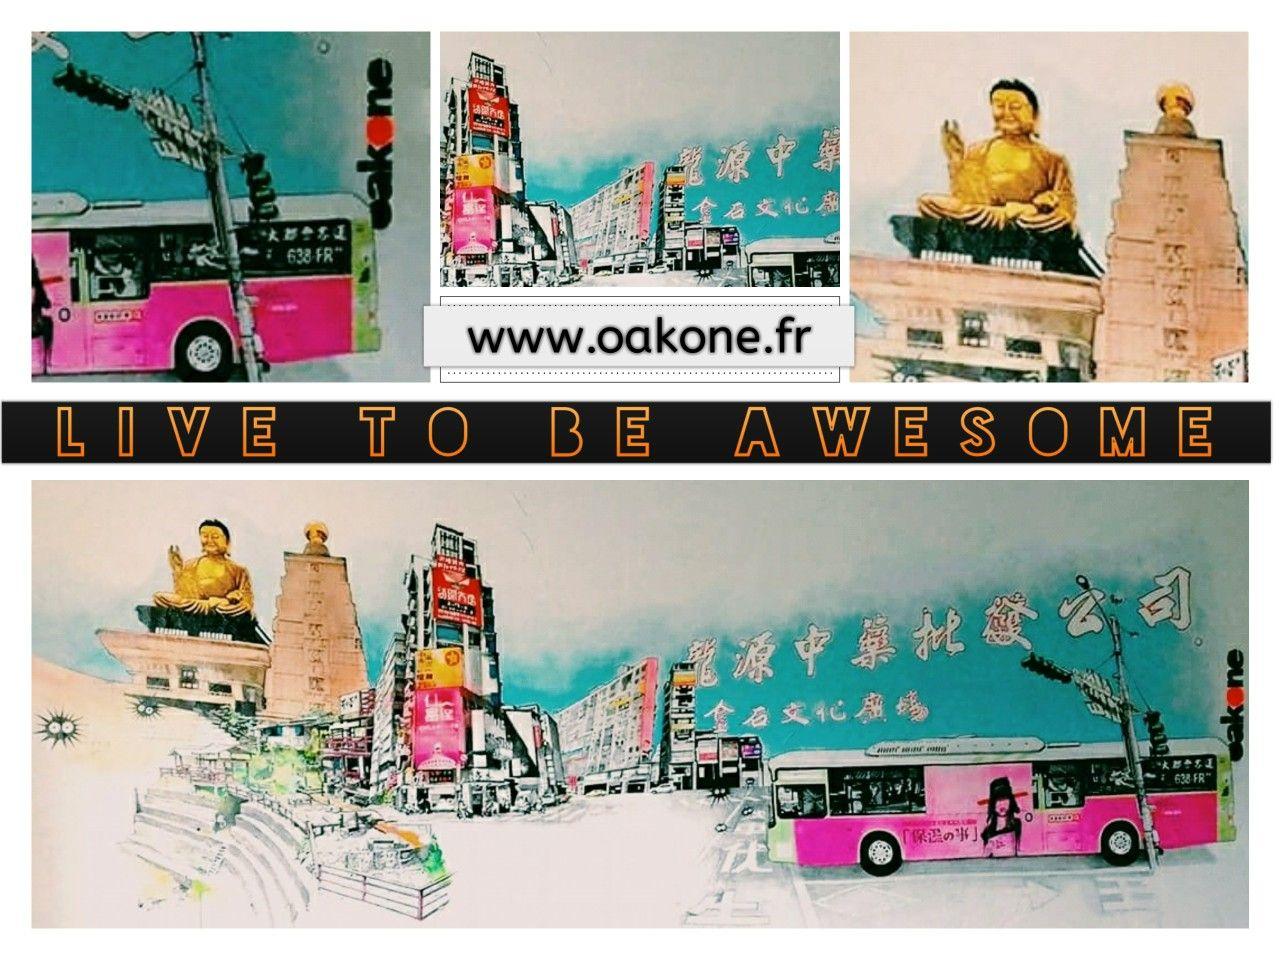 #OakOne #streetart #streetartist #fresquemurale #particulier #asian #Bouddha #temple #tourisme #voyage #evasion #awesome #heart